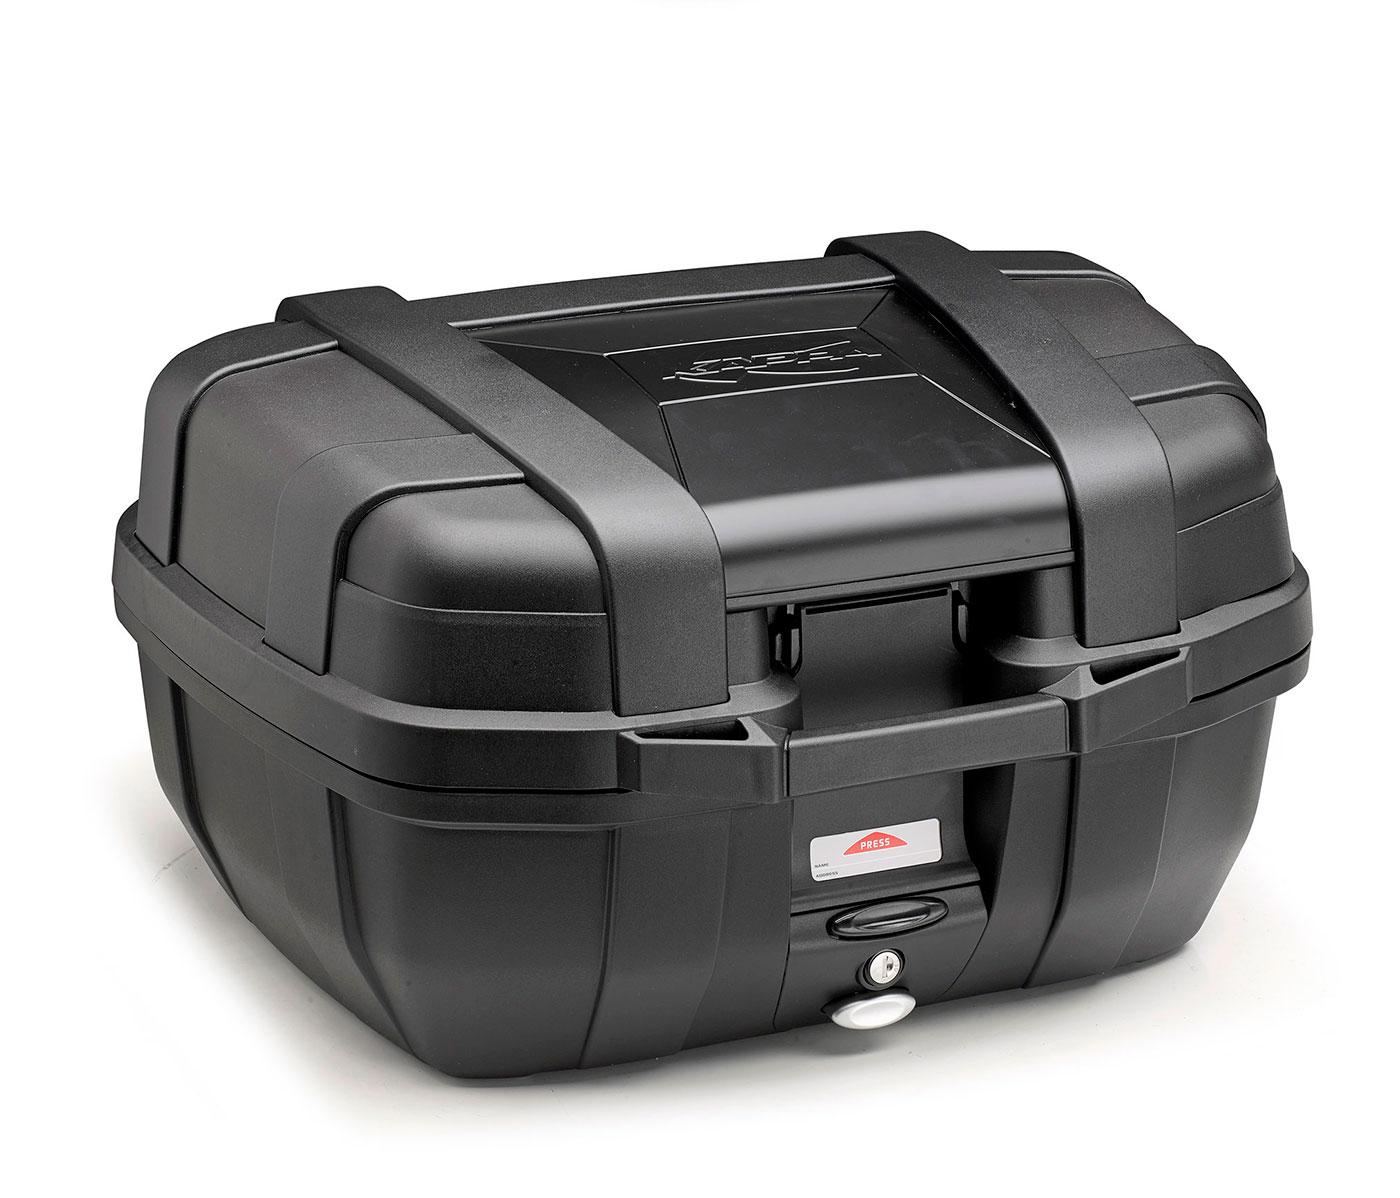 set di valigie rigide Garda di Kappa